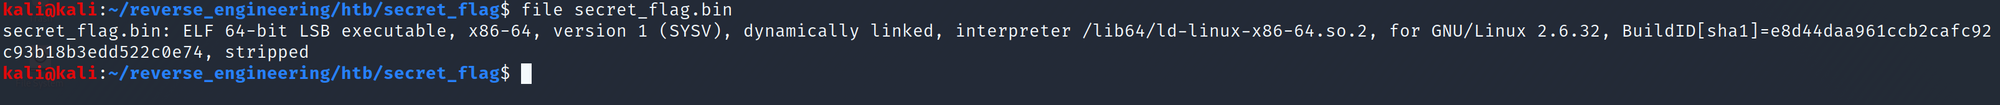 File output